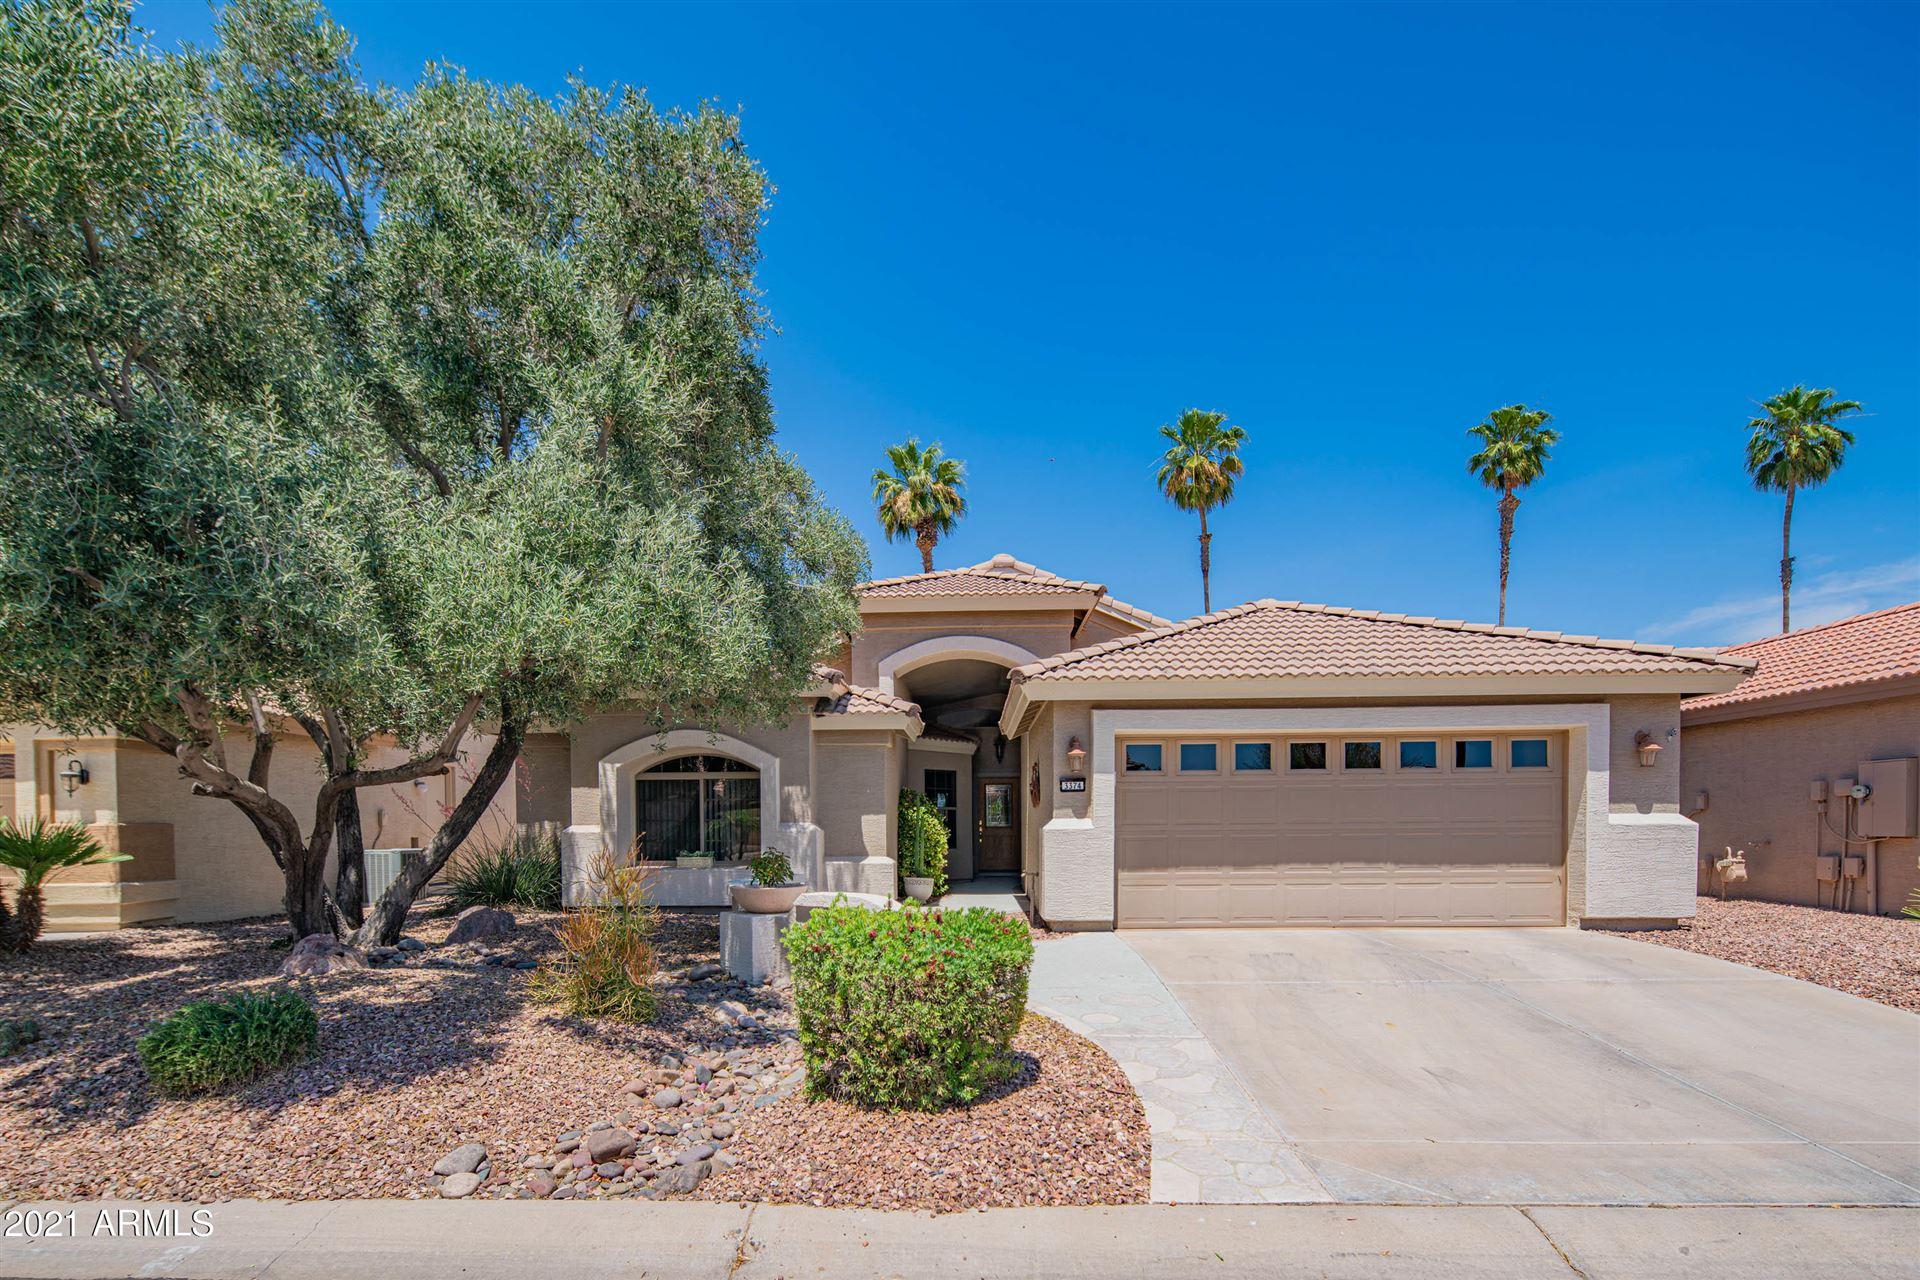 Photo of 3374 N 159TH Avenue, Goodyear, AZ 85395 (MLS # 6232100)